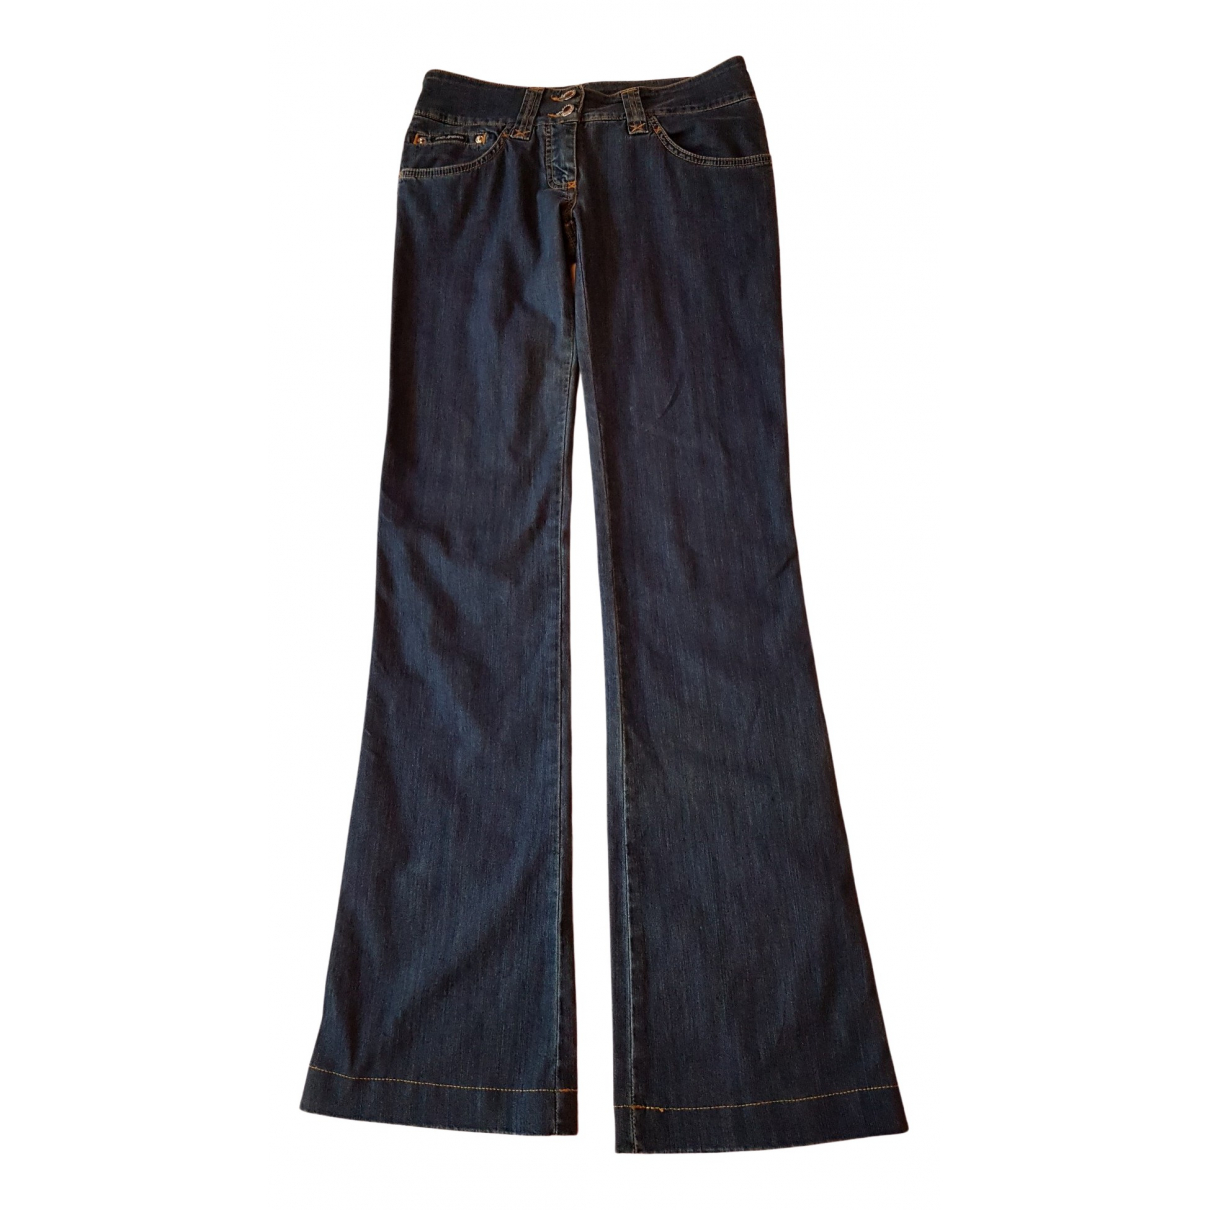 Dolce & Gabbana \N Blue Cotton - elasthane Jeans for Women 34 FR